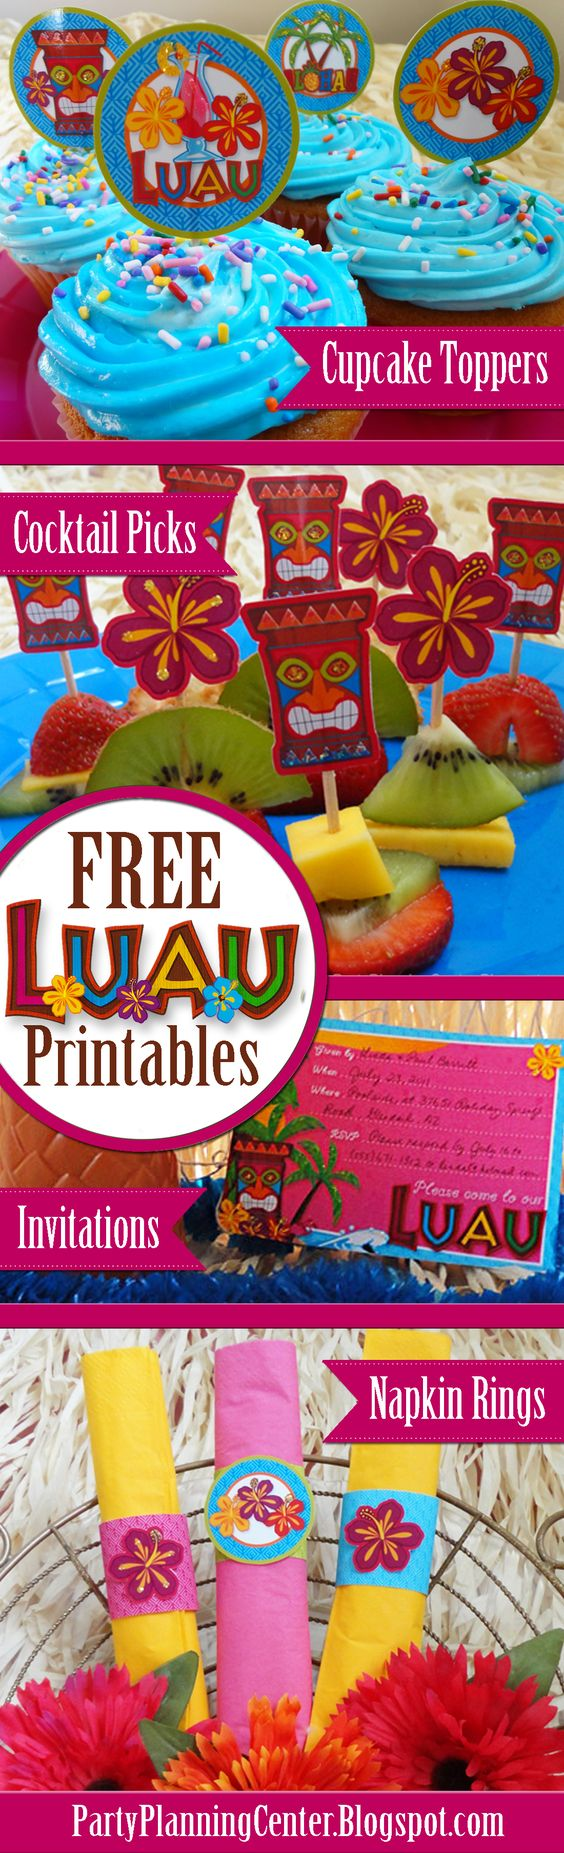 FREE Printable Luau Cupcake Toppers, Cocktail Picks, Invitations and Napkin Rings